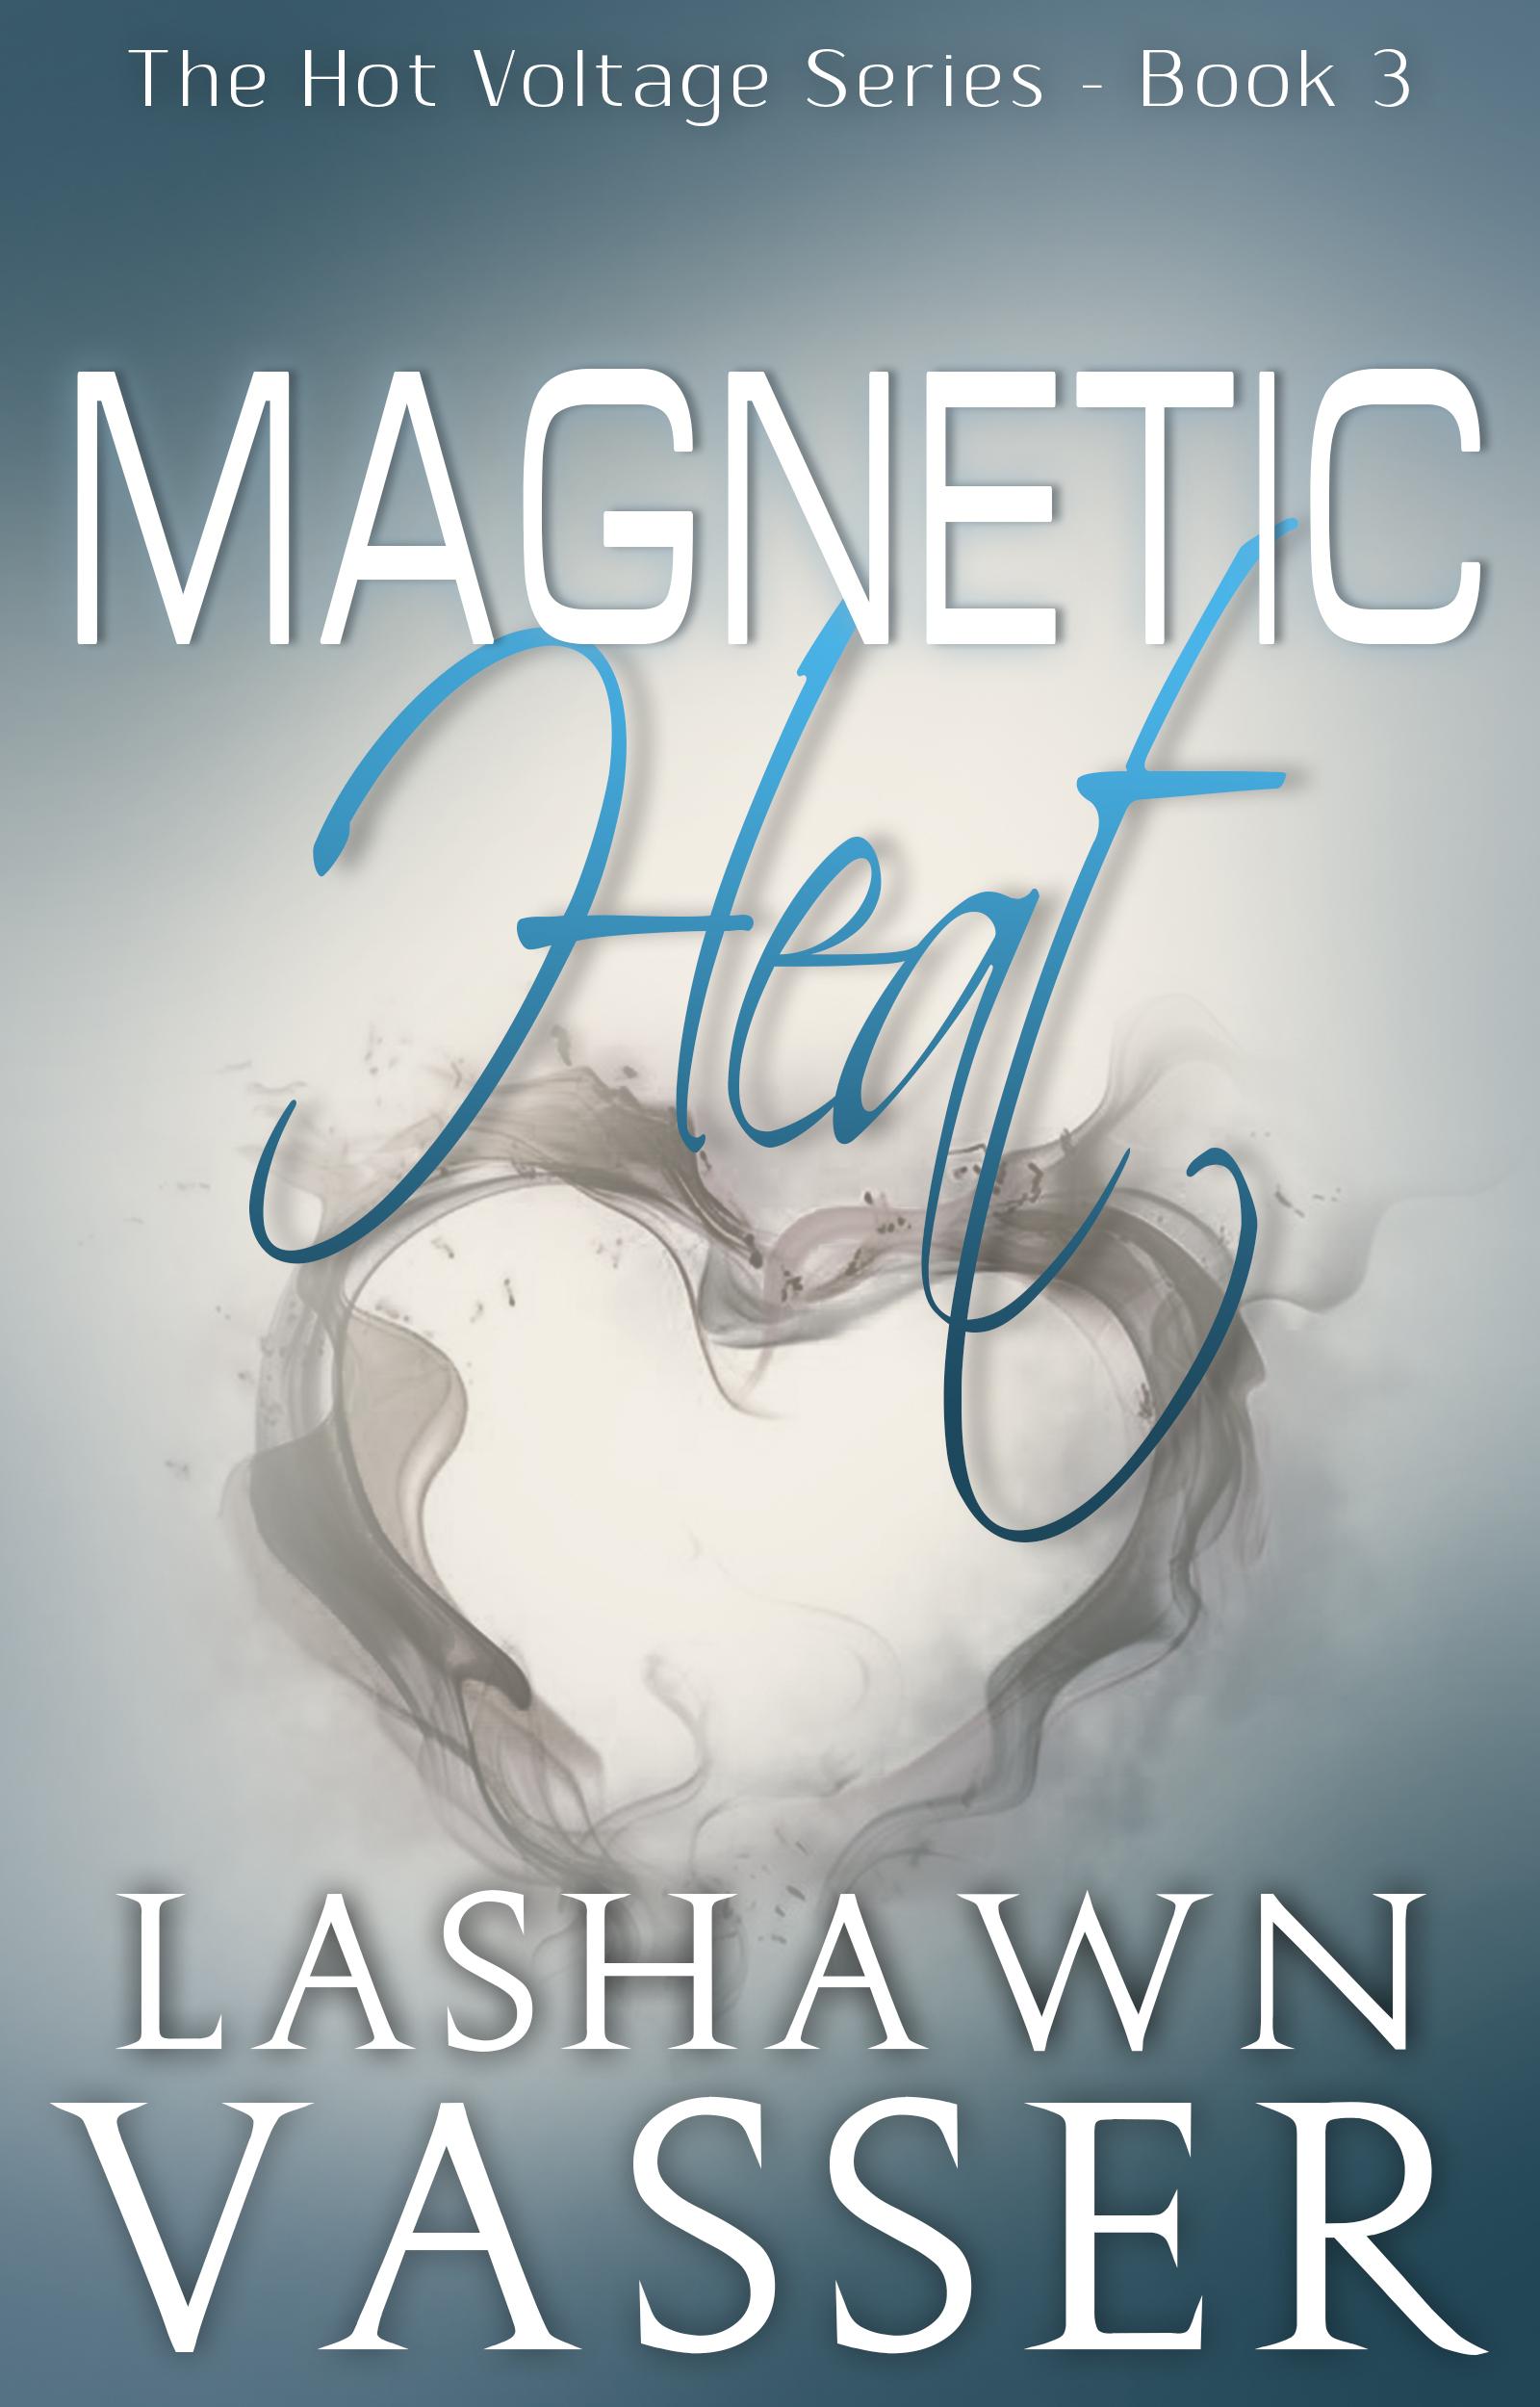 Magnetic Heat Flat.jpg